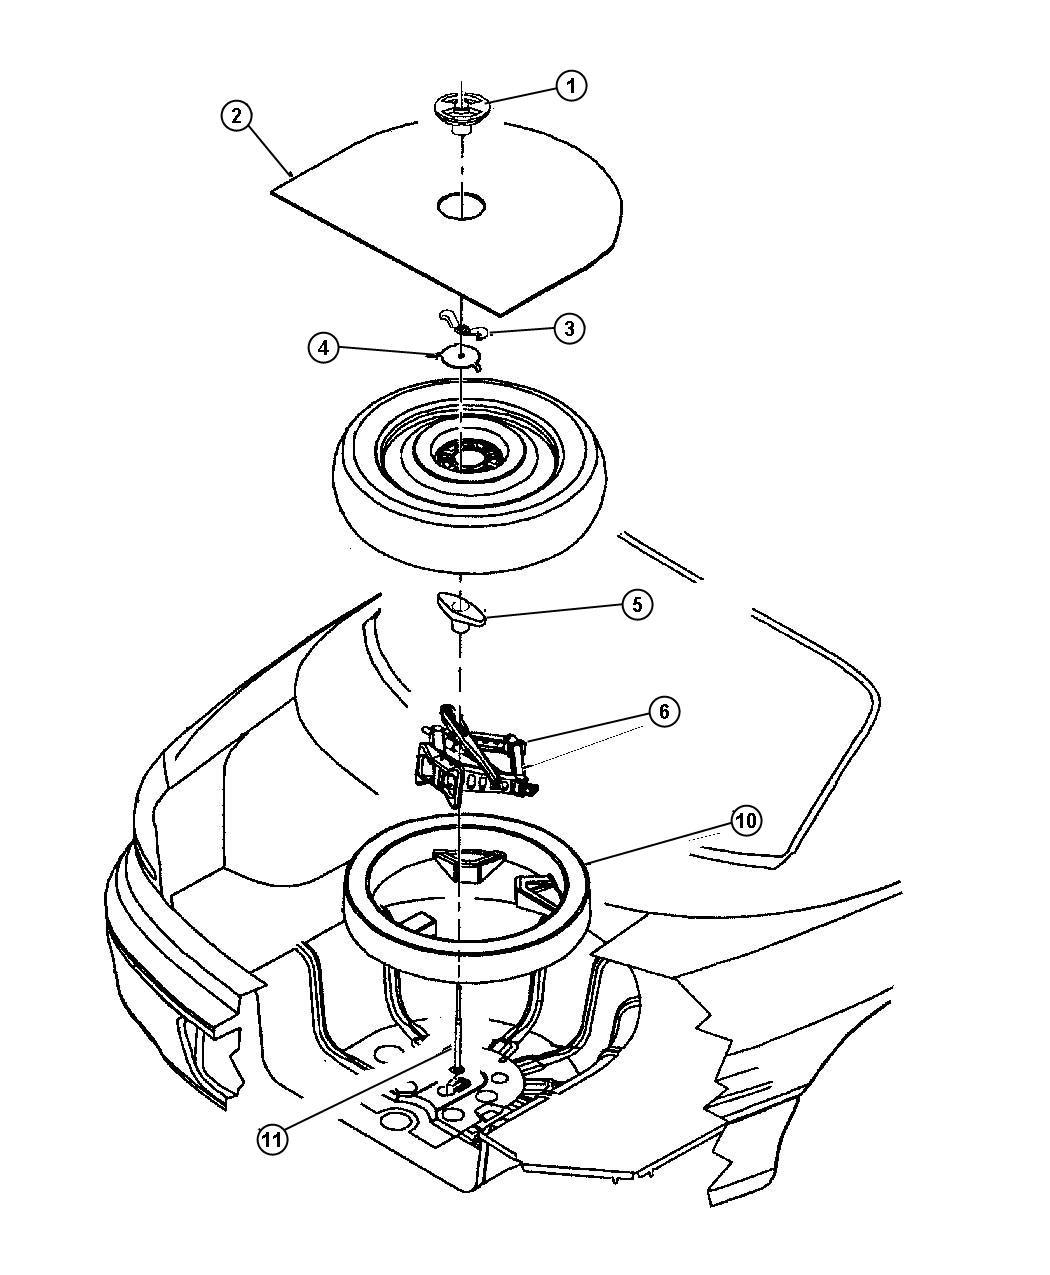 I on 1999 Chrysler Concorde Engine Diagram